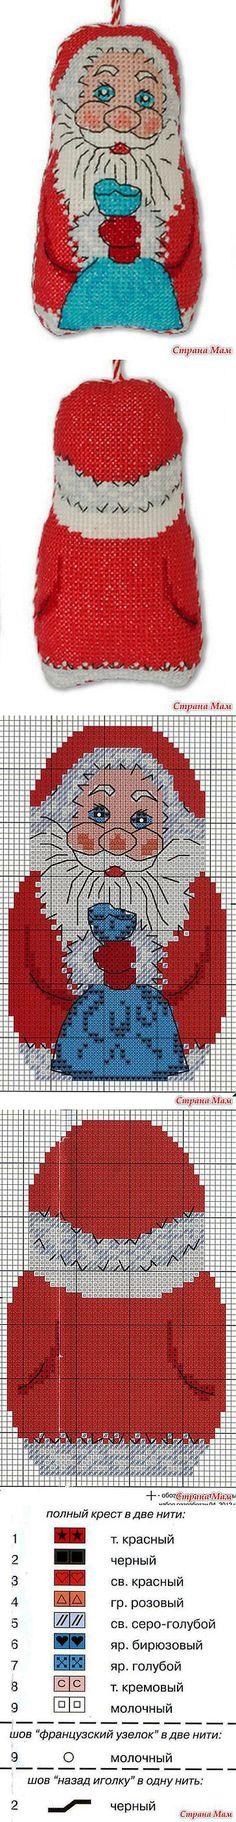 "Декоративная подвеска ""Дед Мороз"": Дневник группы ""Бискорню и другие ""кривульки"""" - Страна Мам Xmas Cross Stitch, Cross Stitch Kits, Cross Stitch Charts, Cross Stitching, Cross Stitch Patterns, Christmas Charts, Christmas Cross, Christmas Ornaments, Embroidery Techniques"